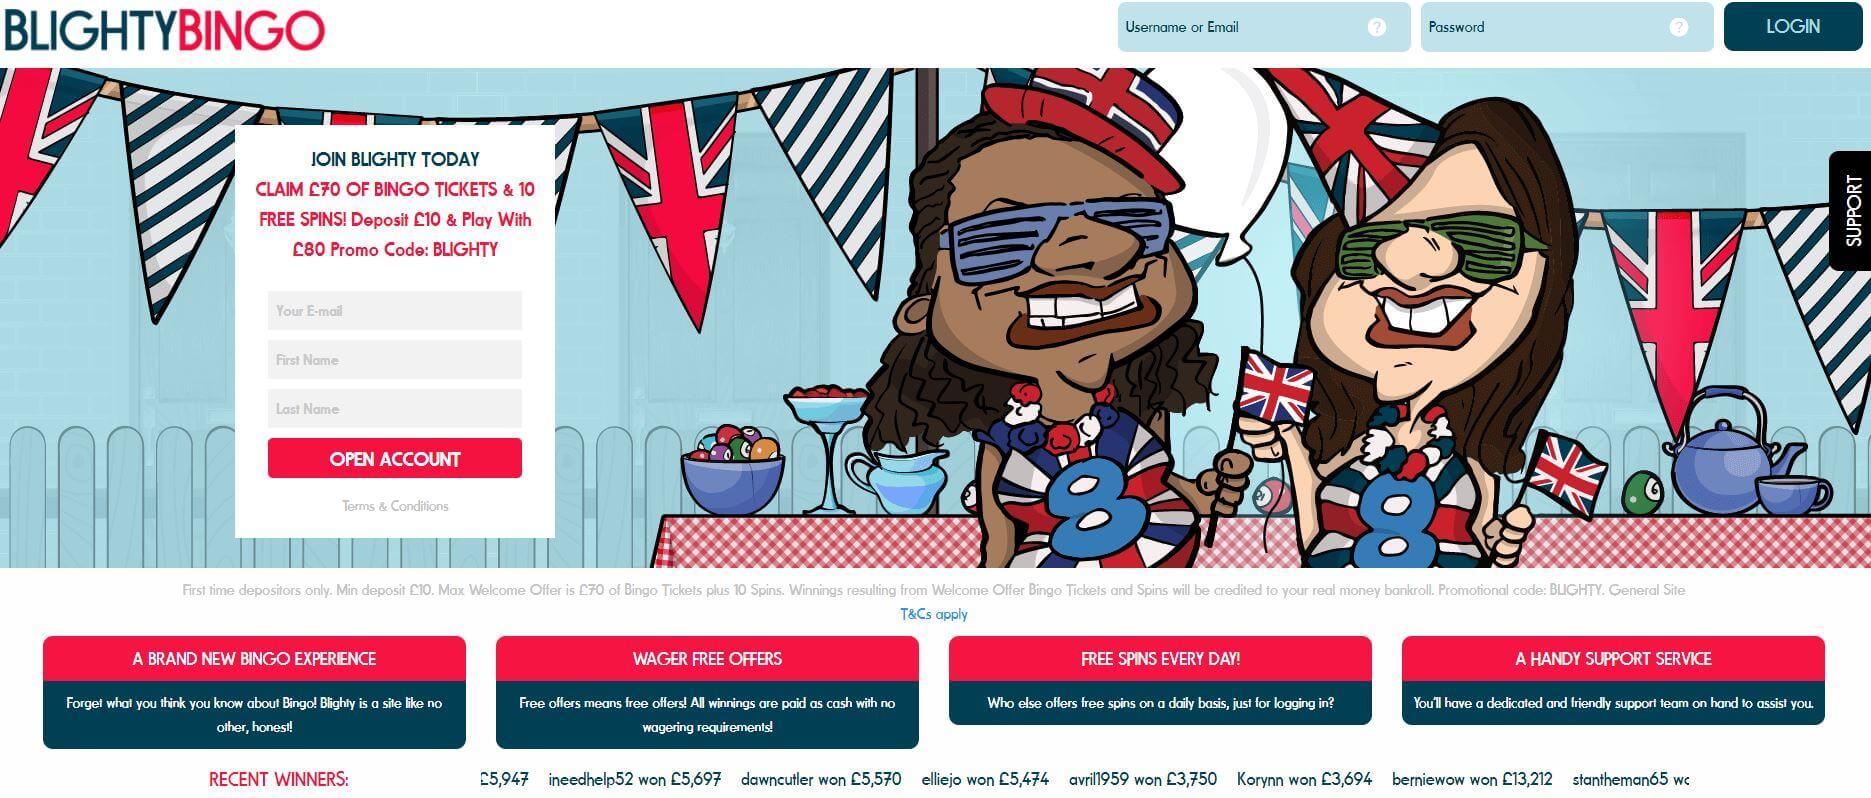 blighty bingo review homepage